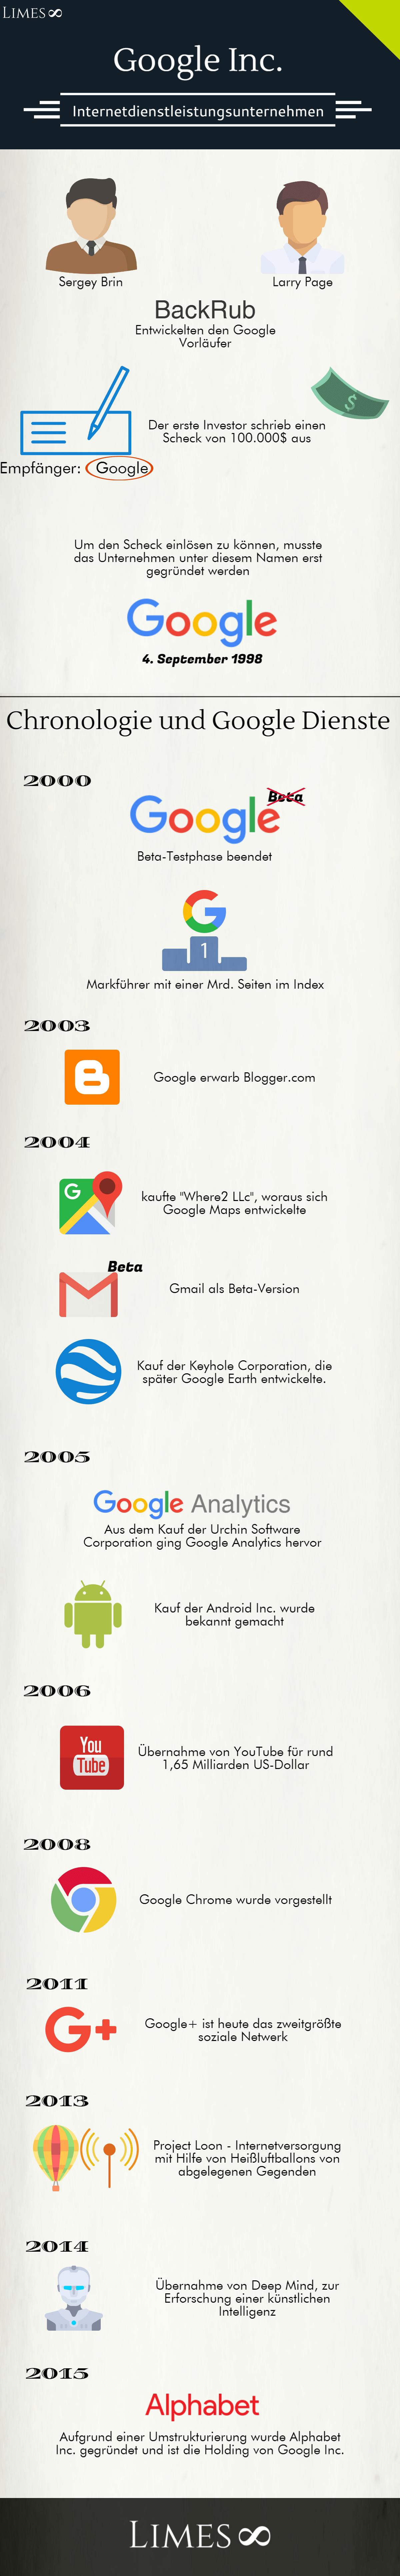 Infografik über die Google Inc.